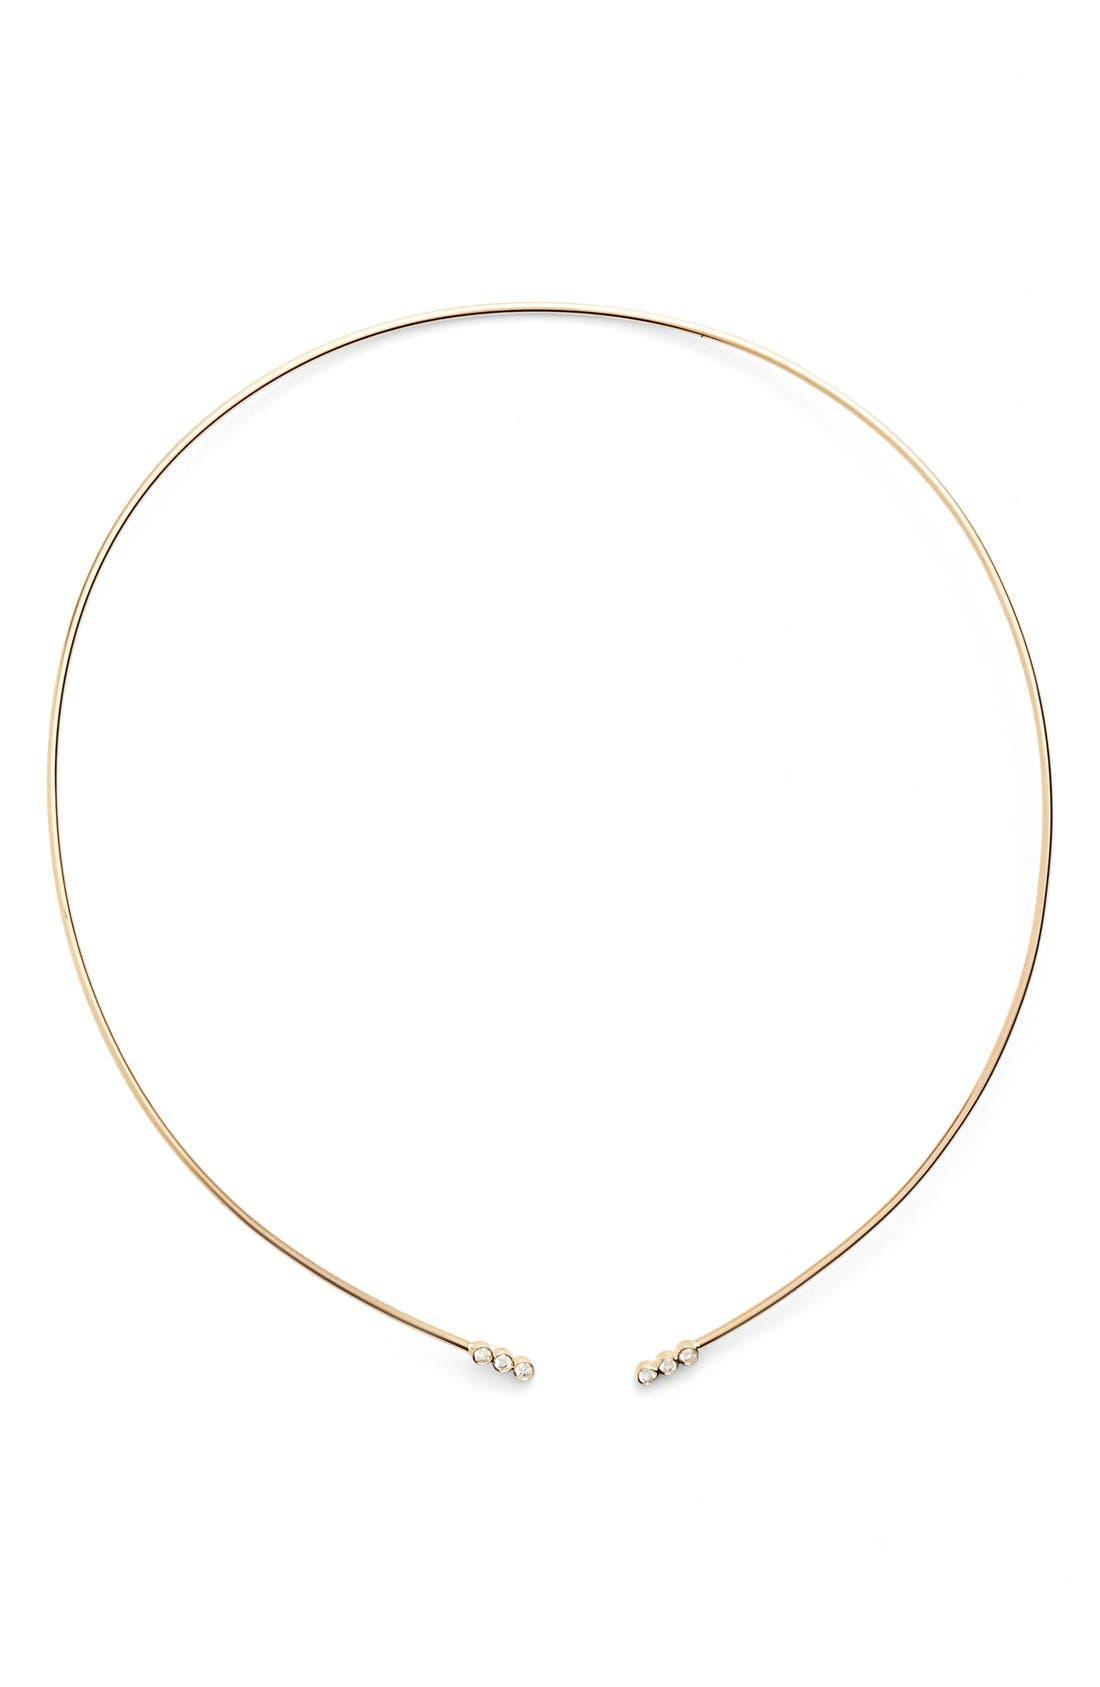 Diamond Collar Necklace,                             Main thumbnail 1, color,                             710